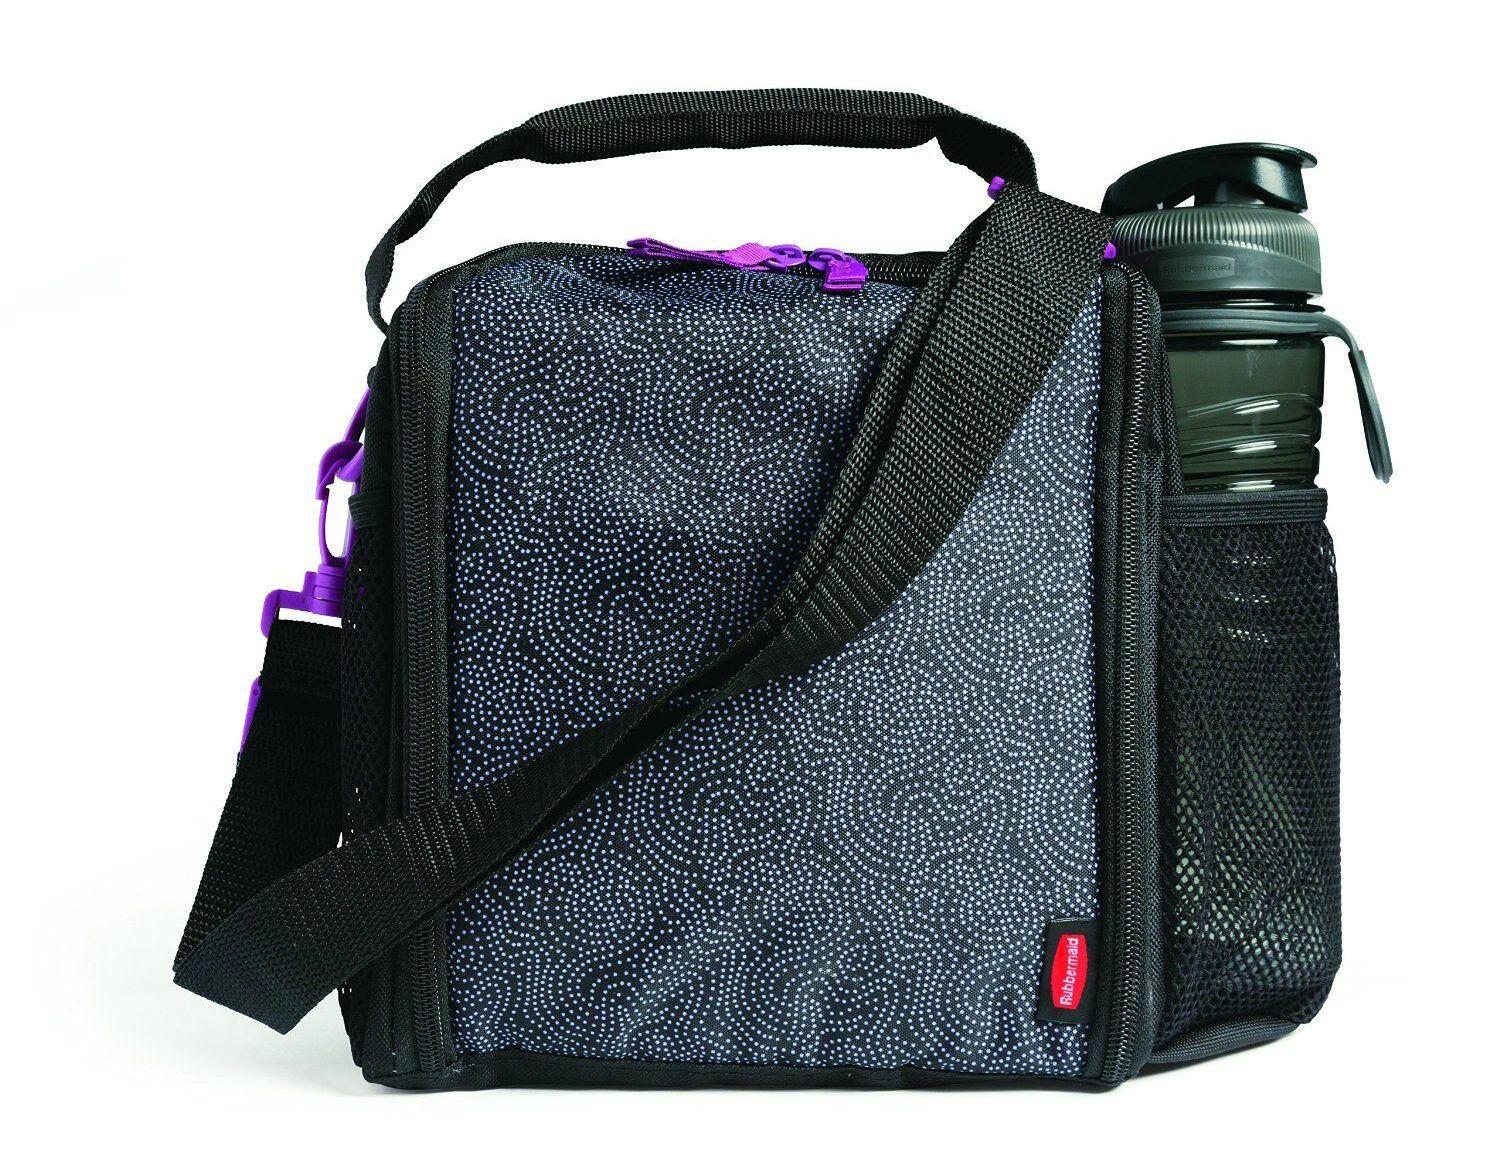 Rubbermaid LunchBlox Lunch Bag